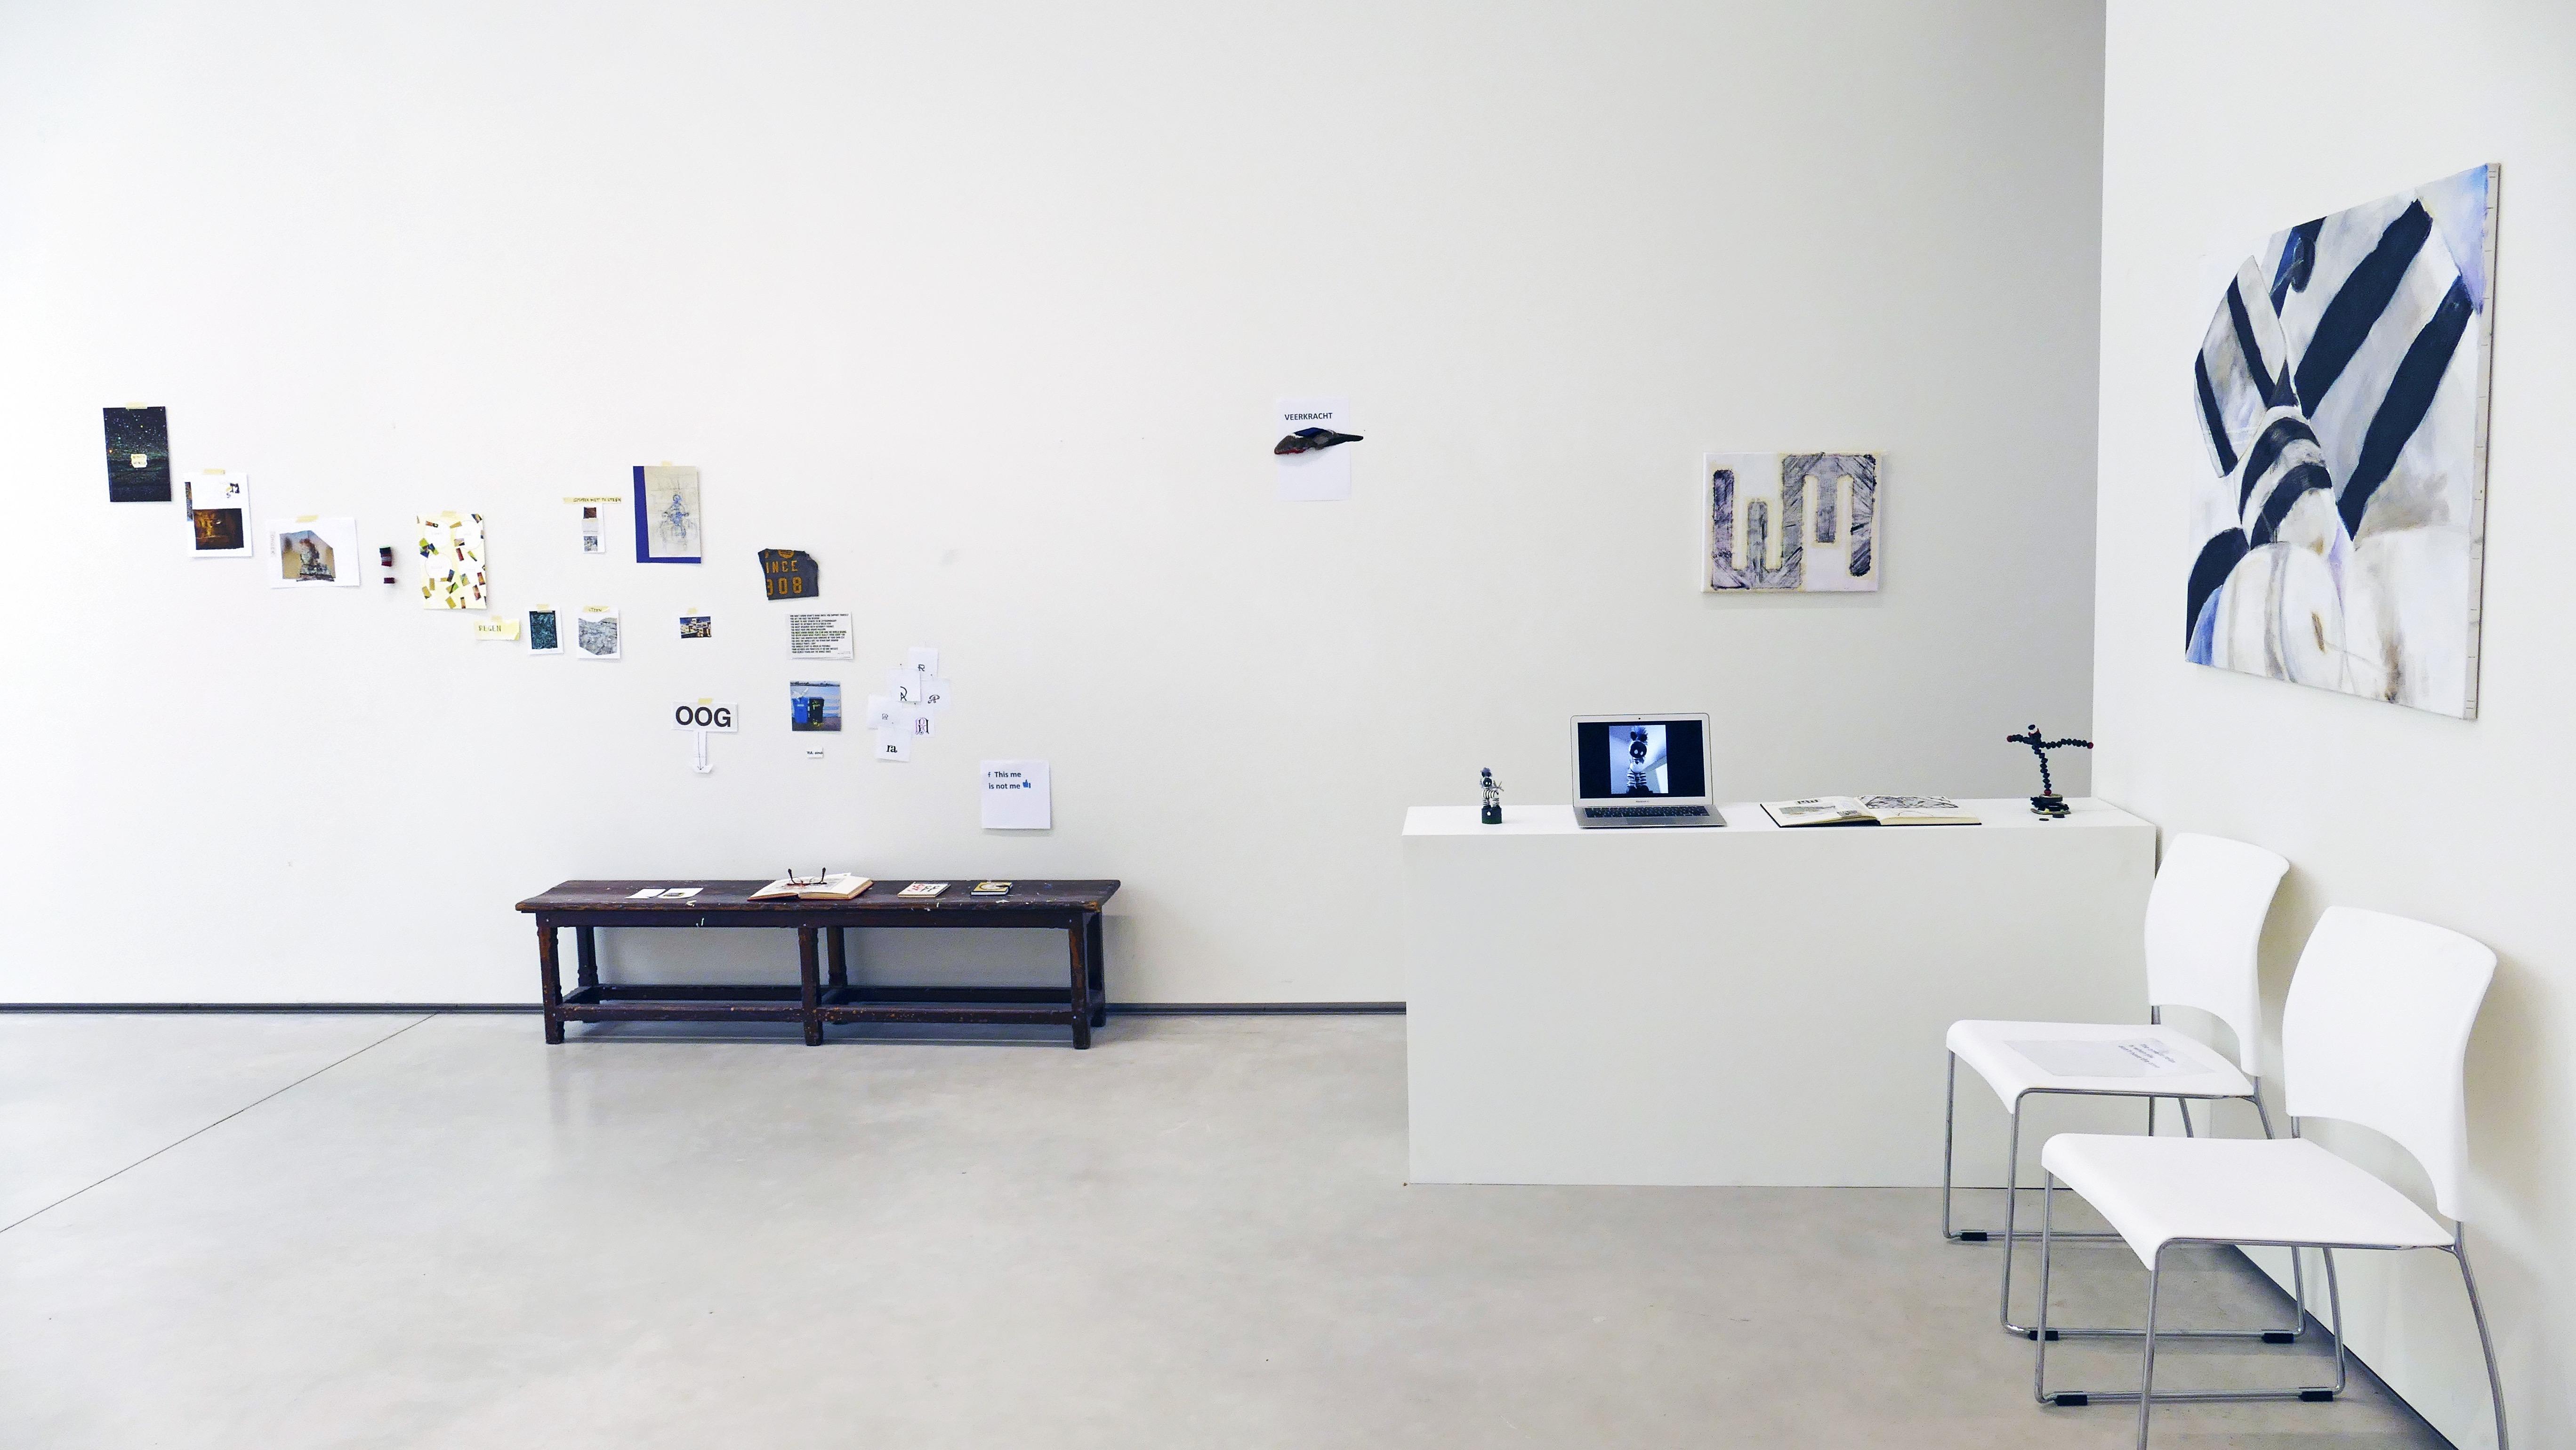 Galerie Noord Zuid, Arendonk (B)